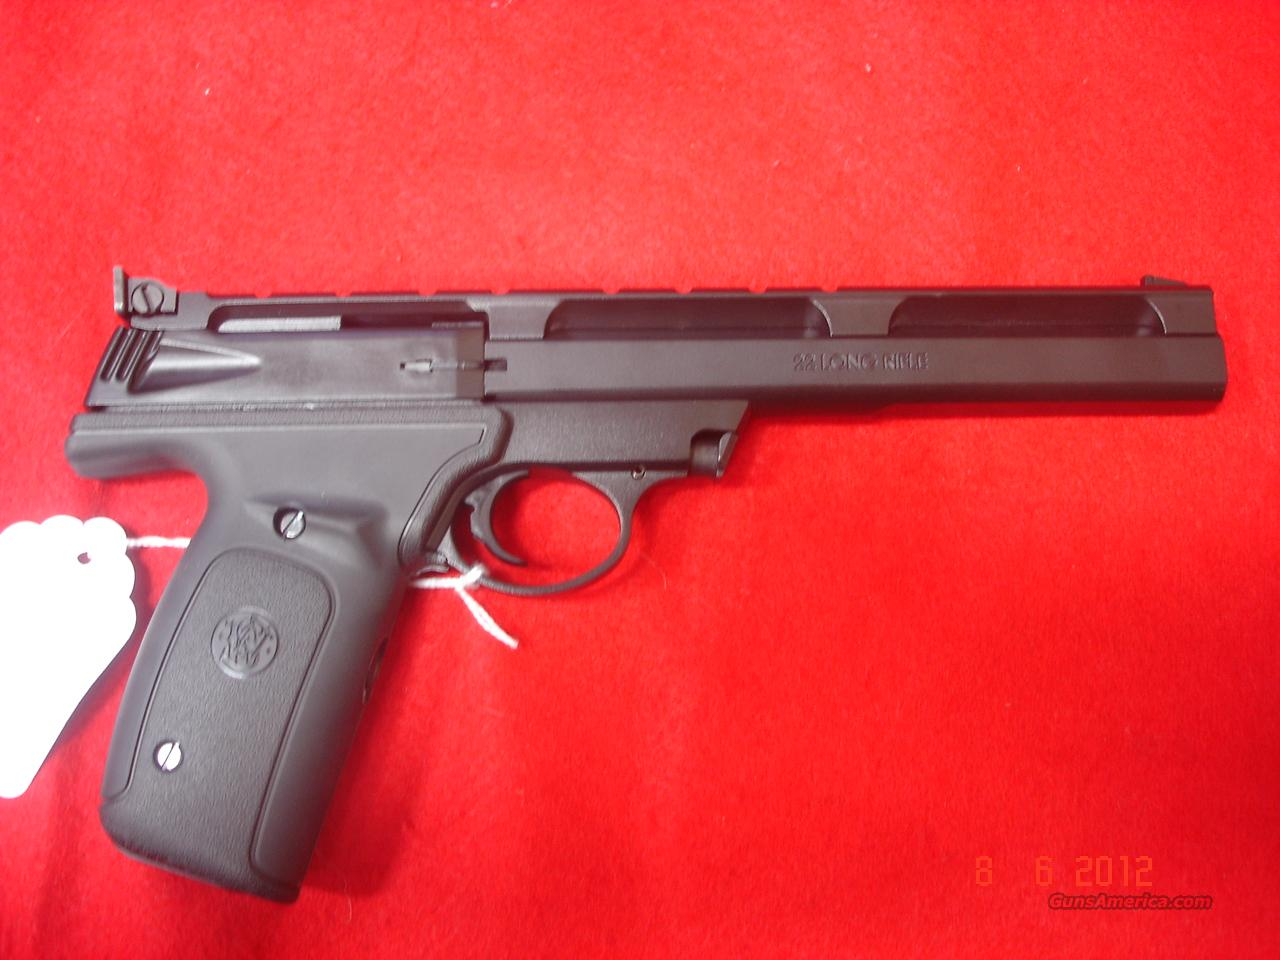 Smith and Wesson Model 22A  Guns > Pistols > Smith & Wesson Pistols - Autos > .22 Autos